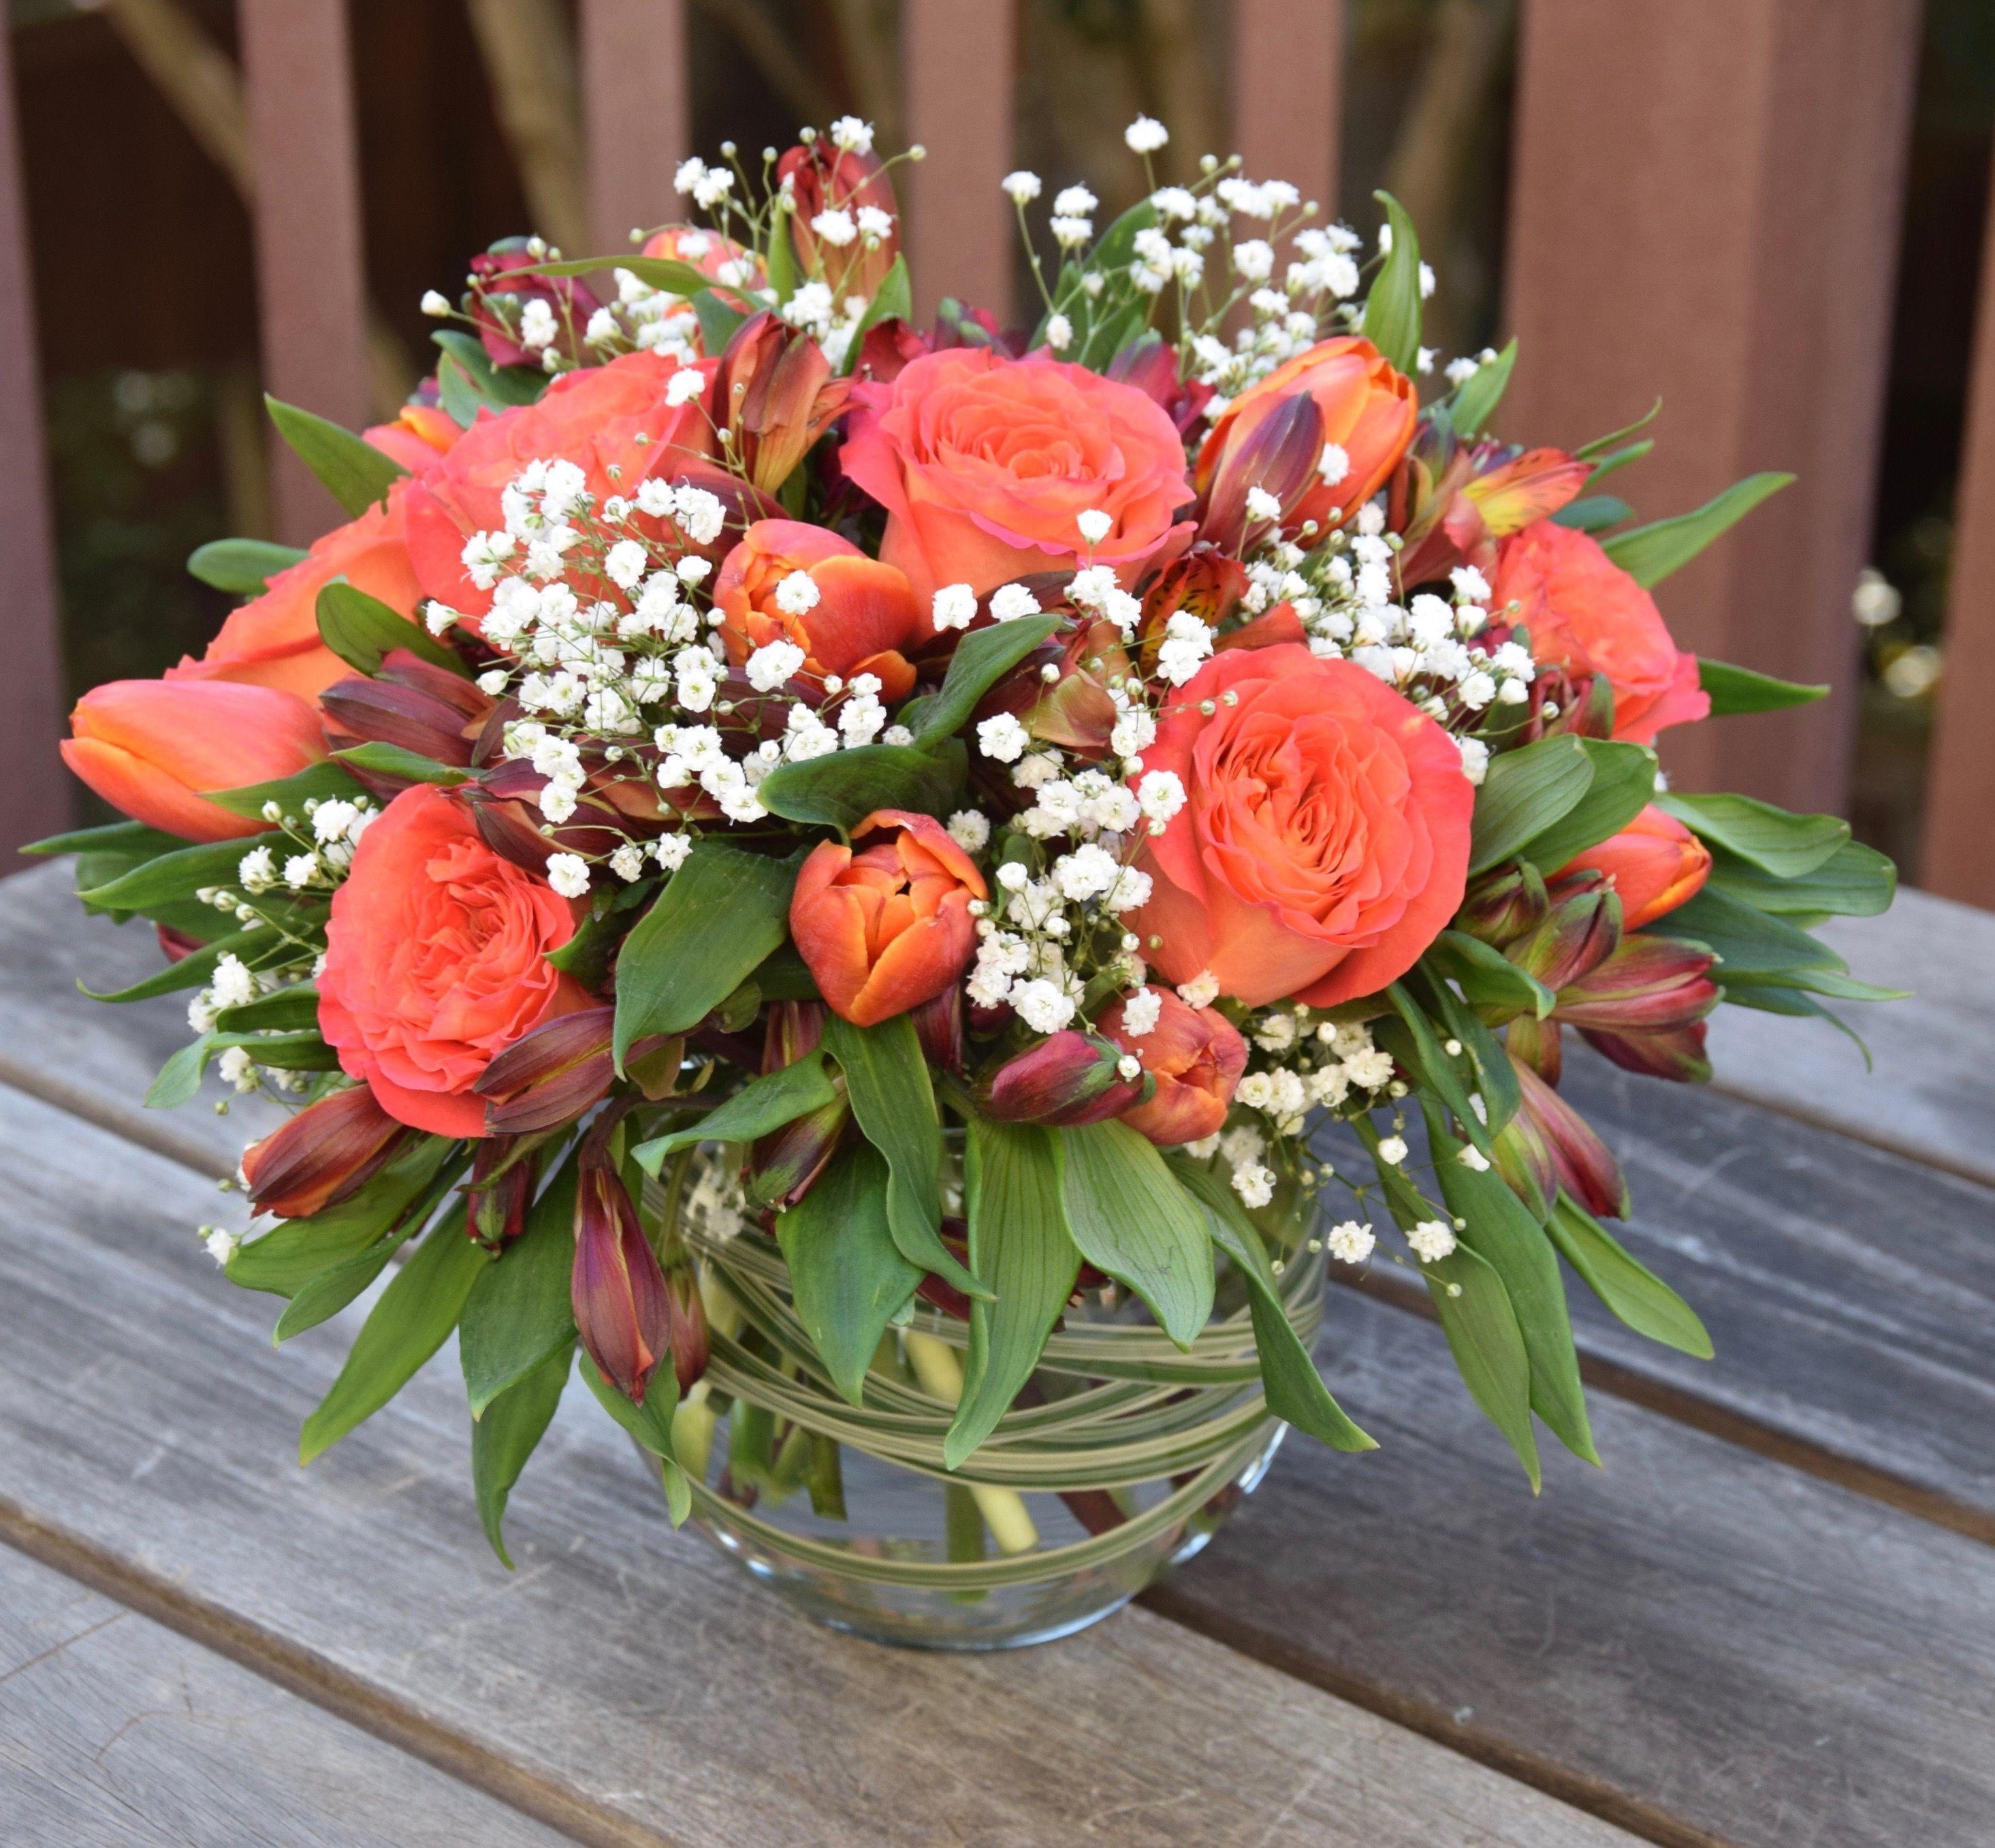 Flower arrangement with roses, tulips, alstroemerias, baby